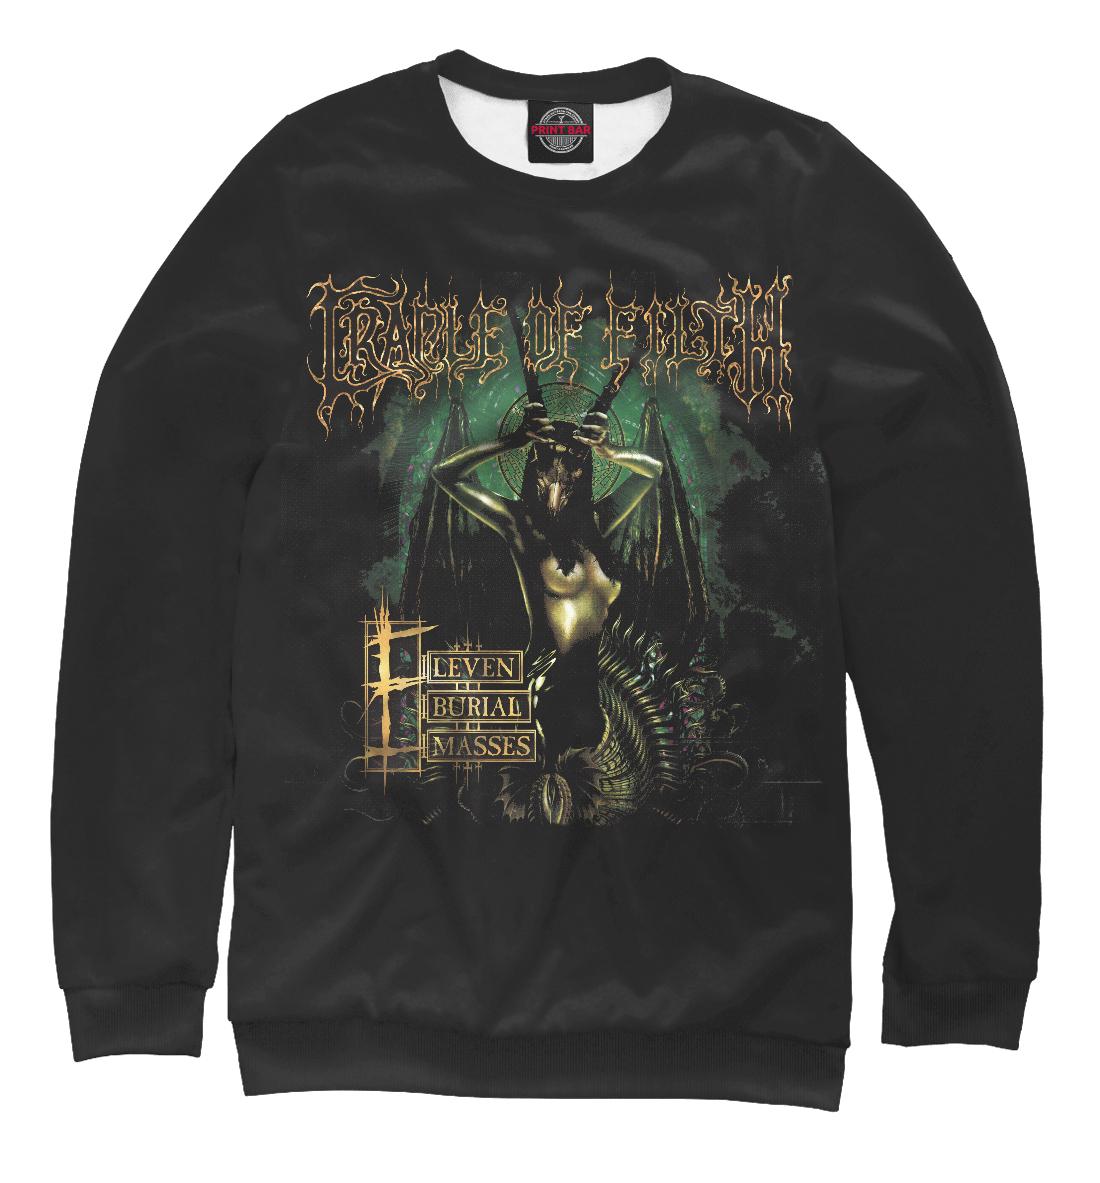 Купить Cradle of Filth: Eleven Burial Masses, Printbar, Свитшоты, MZK-985946-swi-1